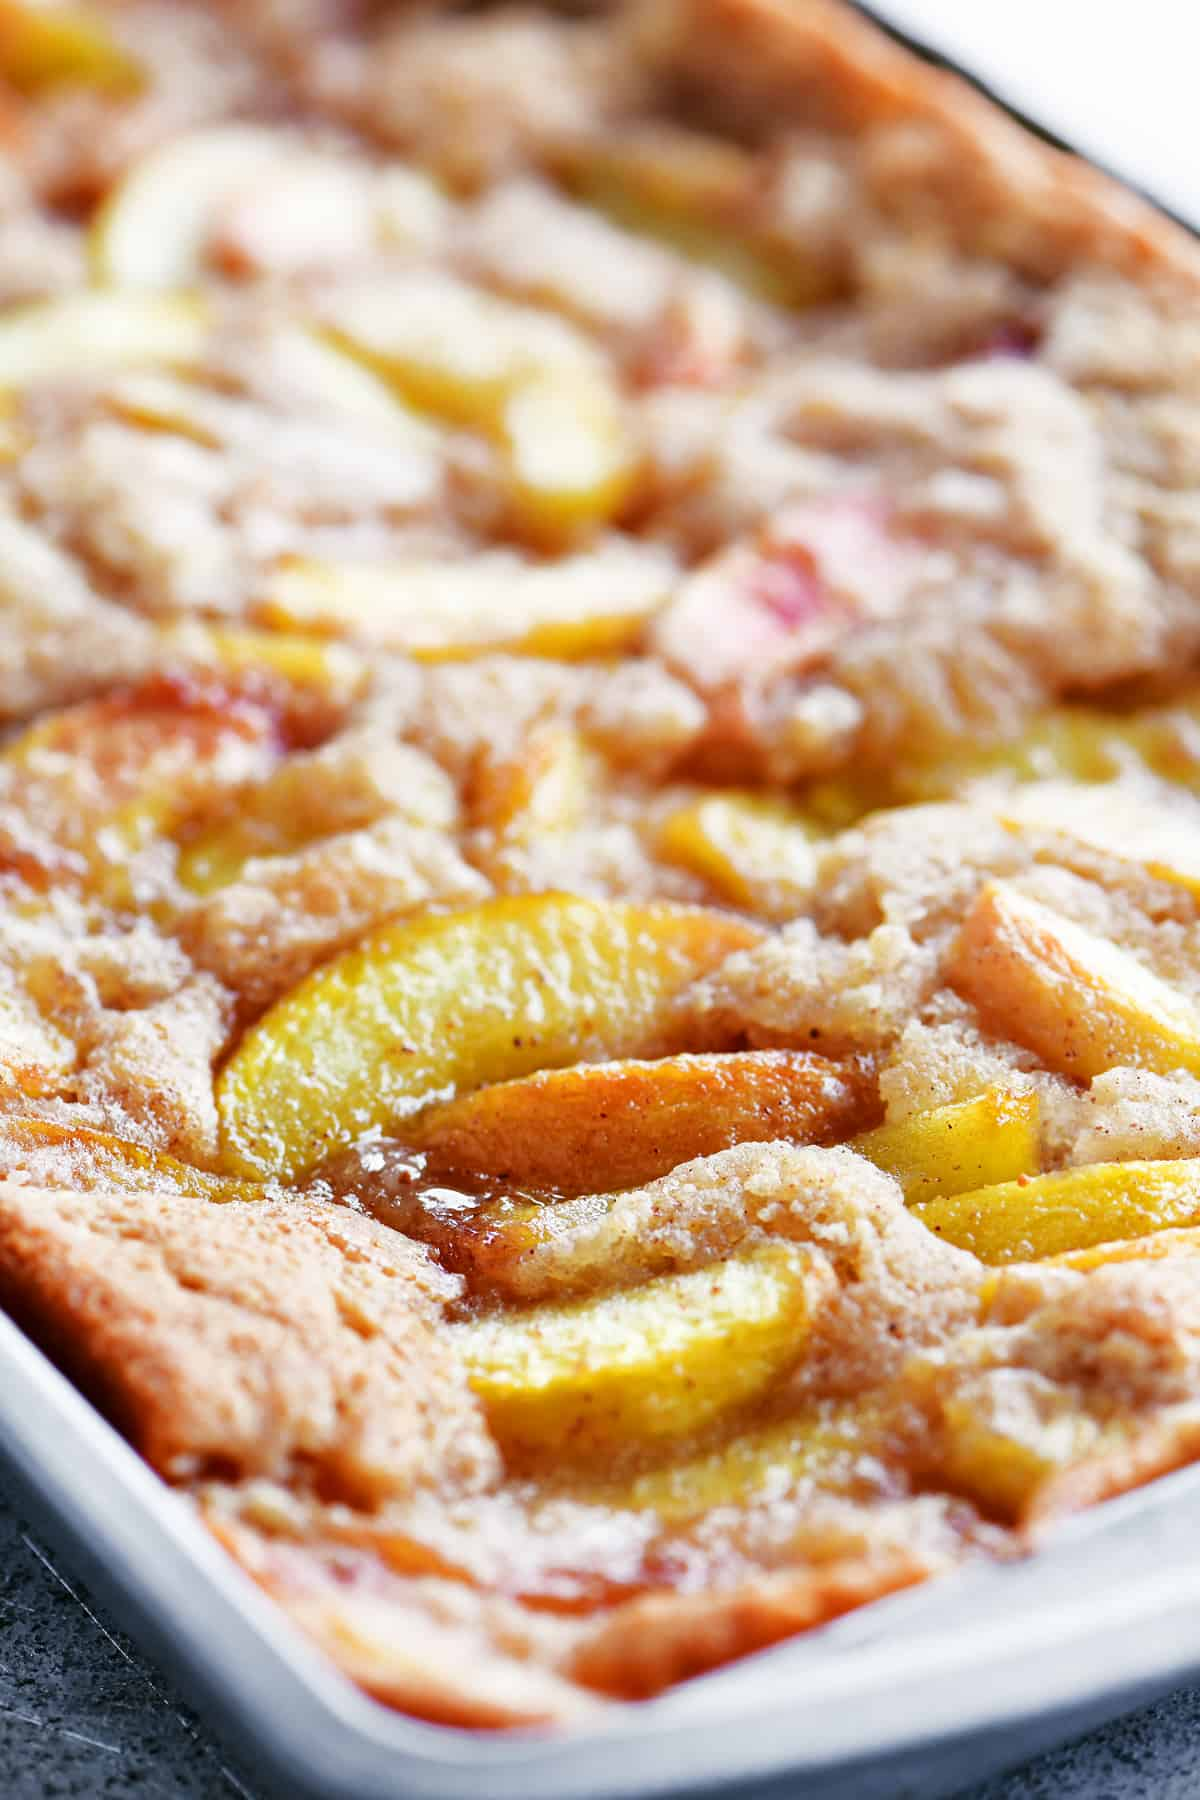 baked peach cobbler in pan